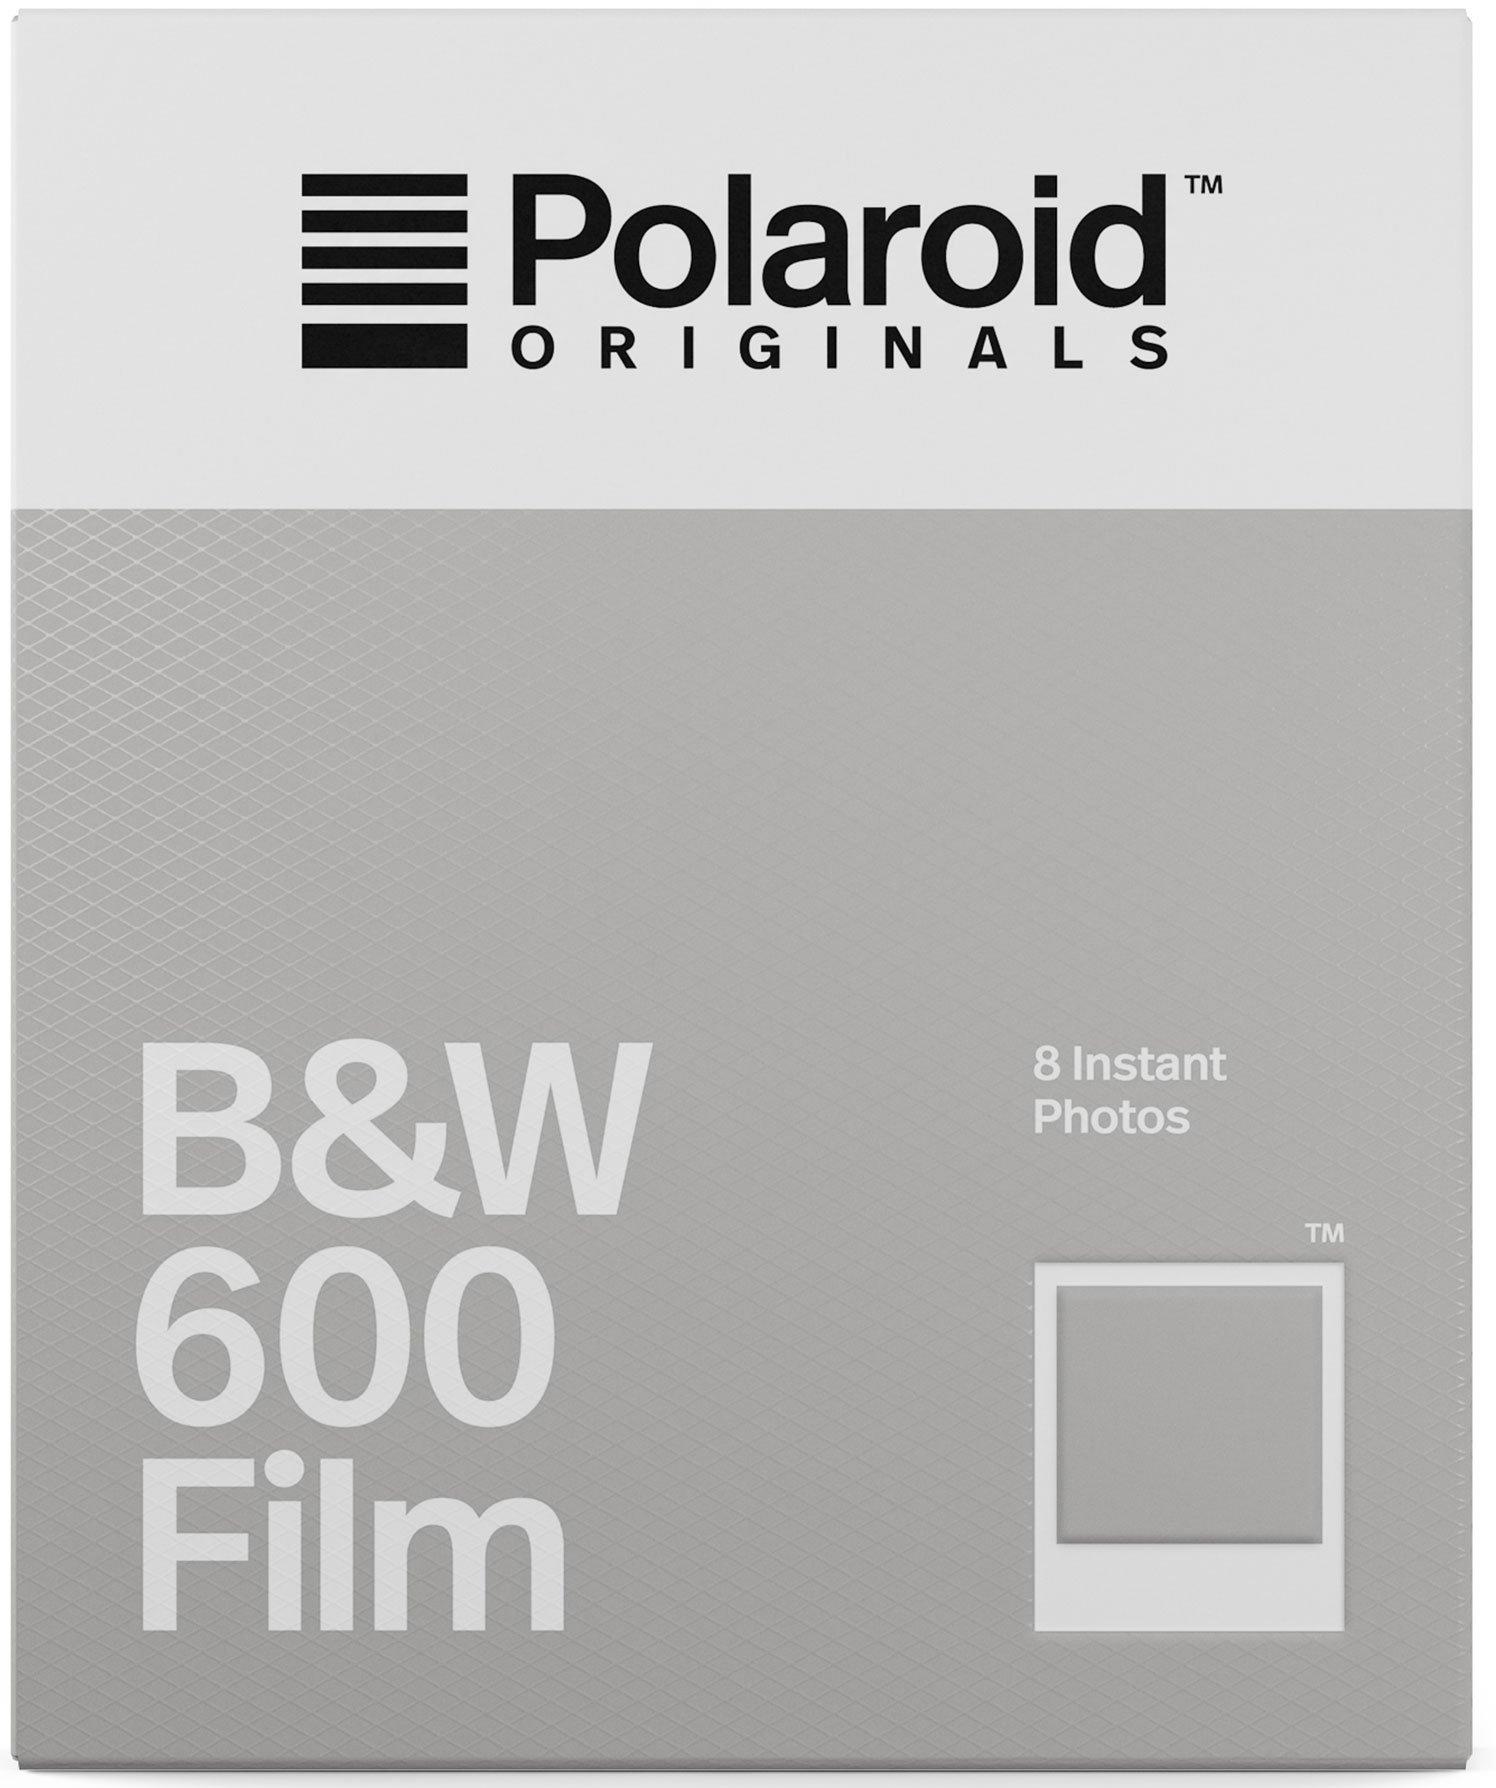 POLAROID ORIGINALS černobílý film pro Polaroid 600/8 snímků